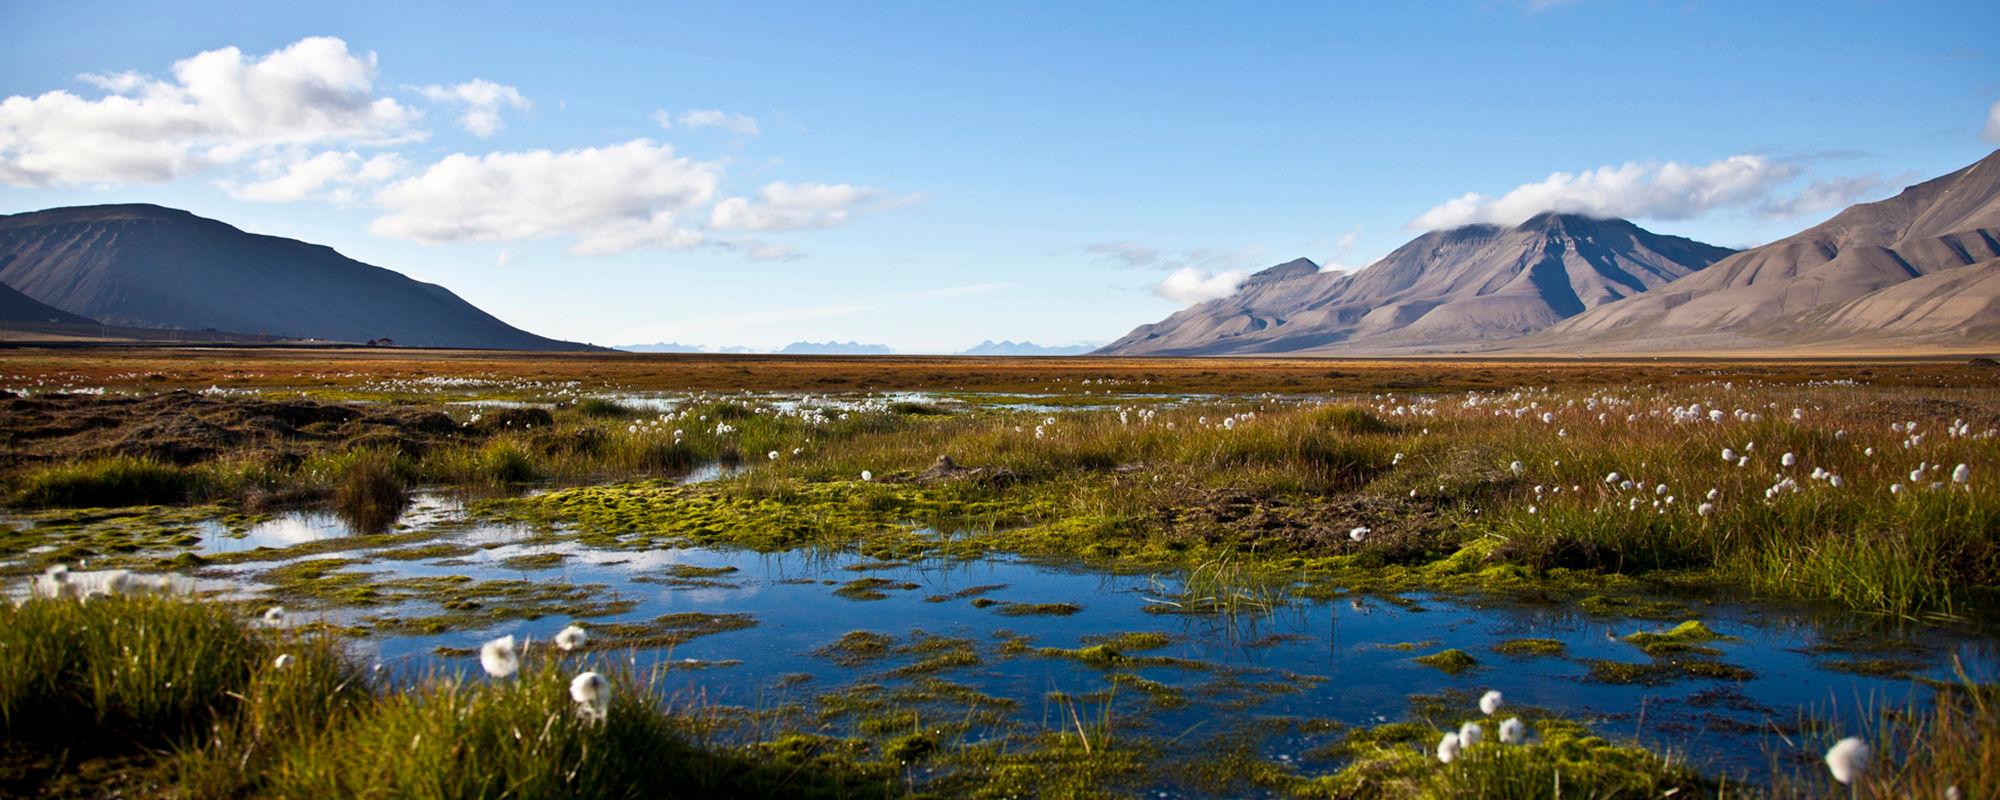 Adventfjord bei Longyearbyen im Sommer